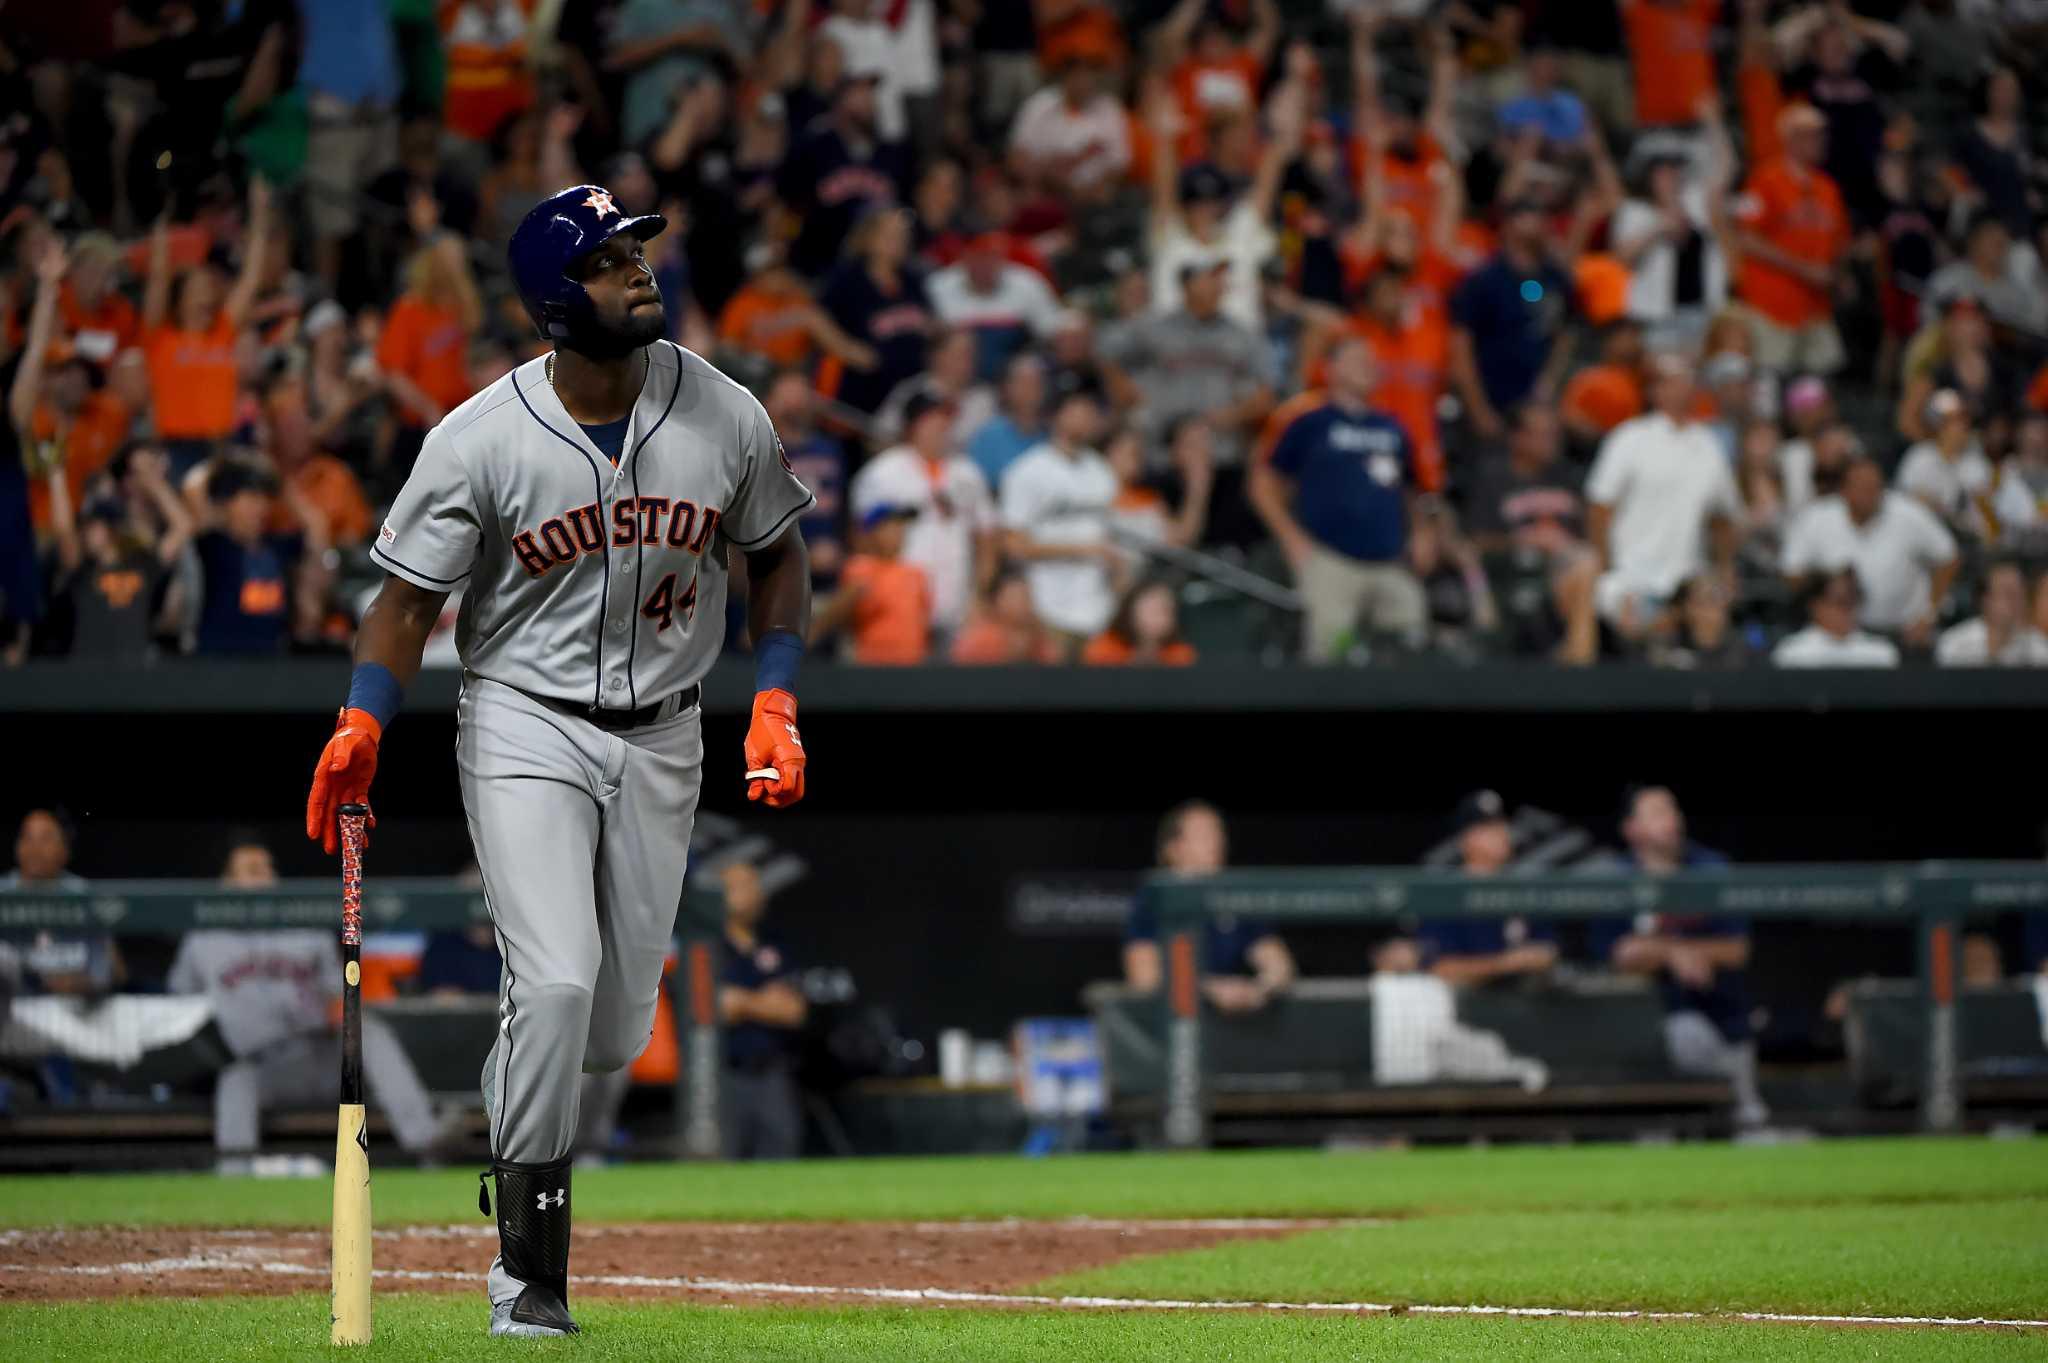 Creech: Alvarez's big night brings up memories of other great Houston rookies